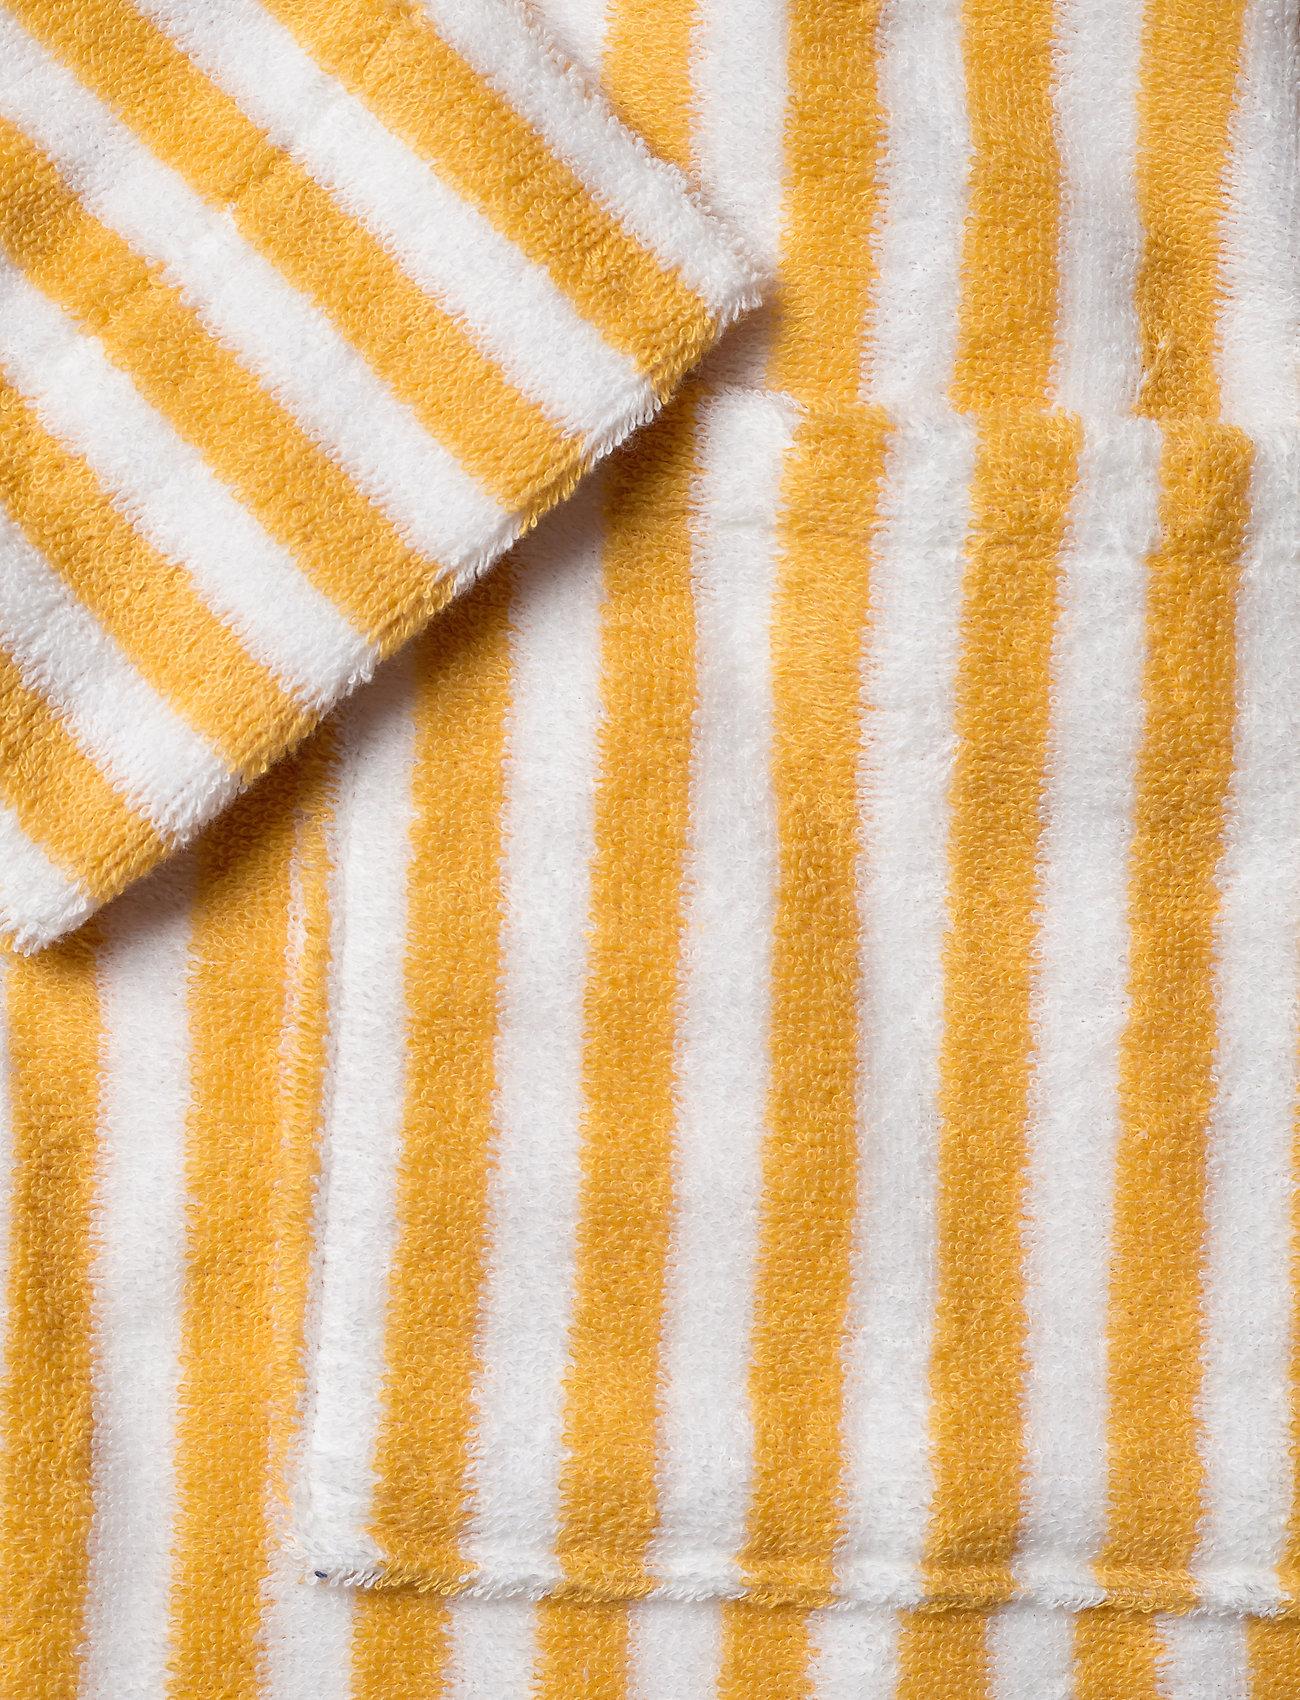 Lexington Home Striped Cotton-Mix Terry Robe - Nattøy & loungeklær YELLOW/WHITE - Menn Klær